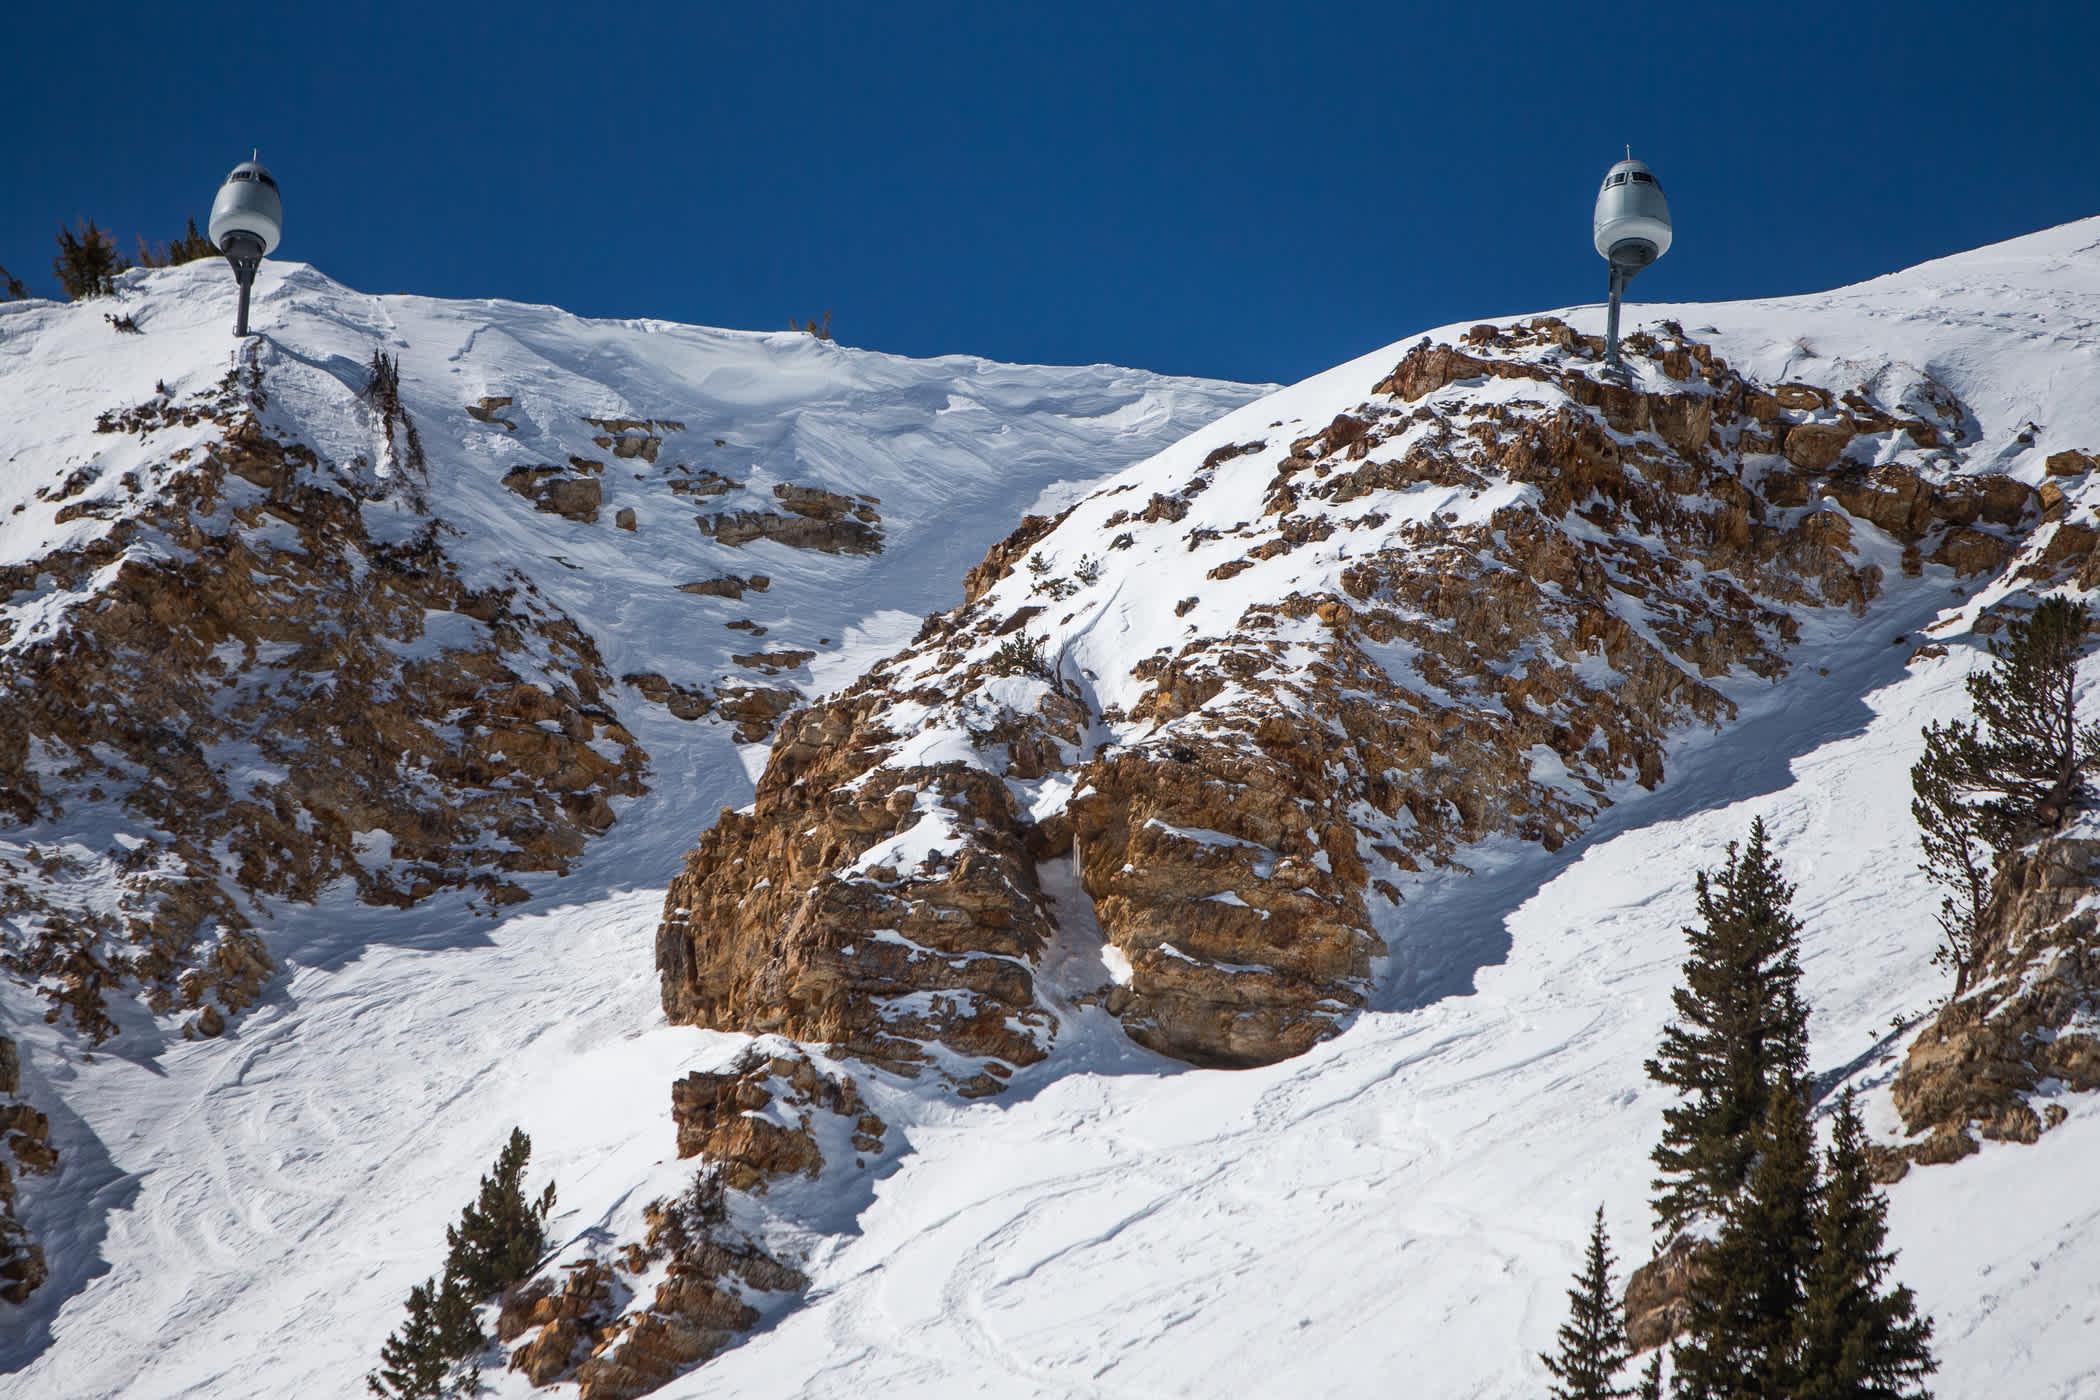 O'Bellx modules on East Baldy at Alta Ski Area